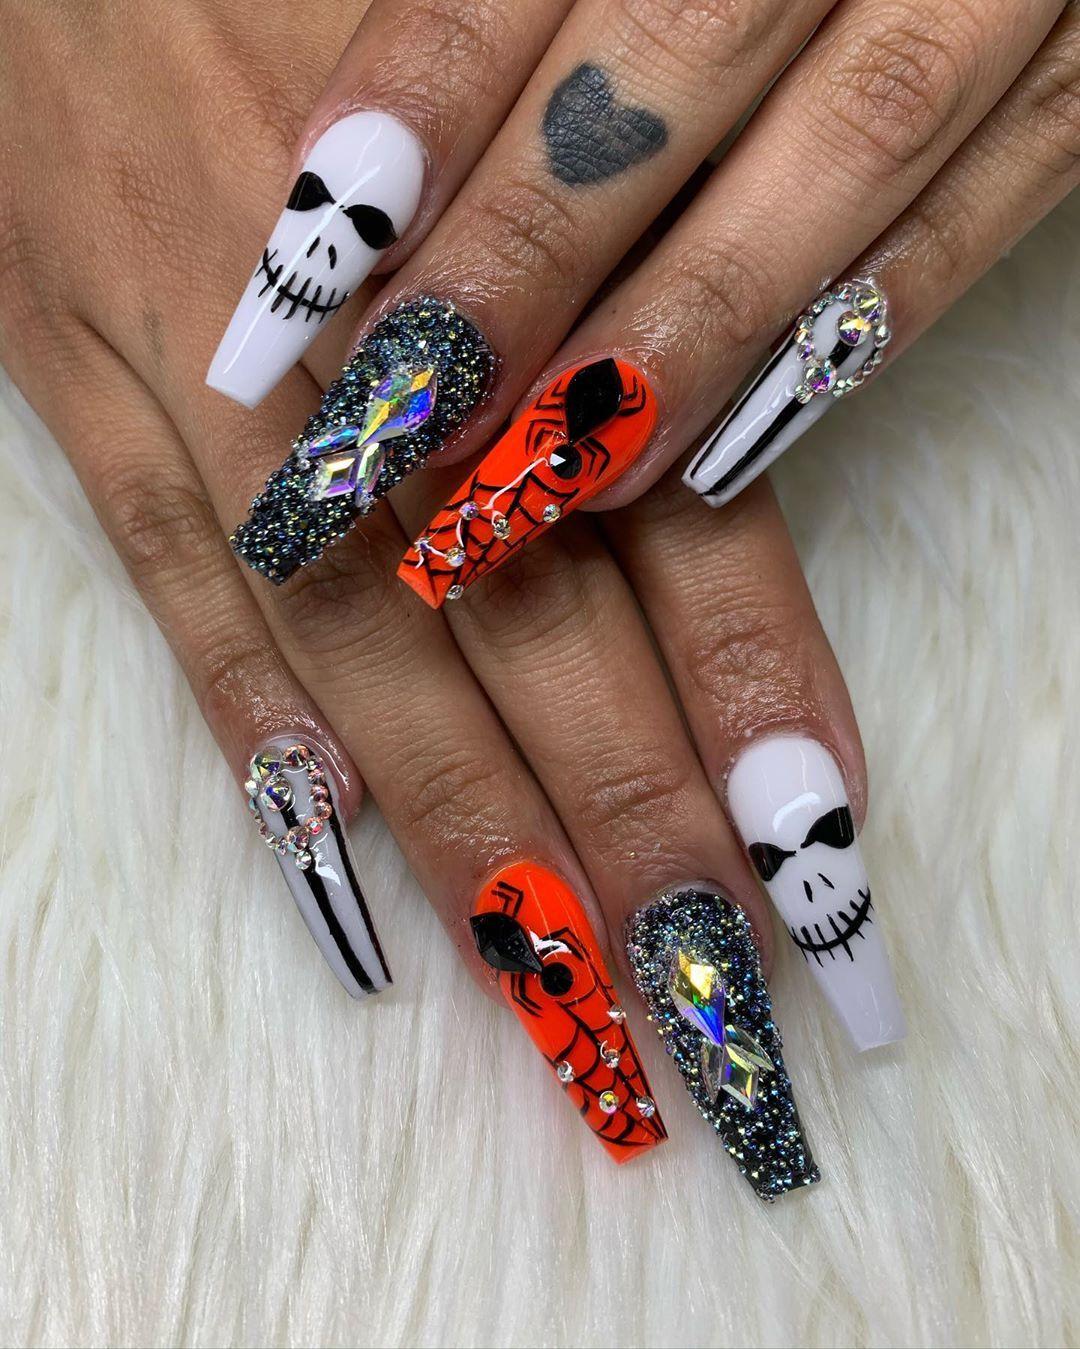 Best Halloween Nails Art Designs 2019 Halloween Acrylic Nails Halloween Nail Designs Halloween Nail Art